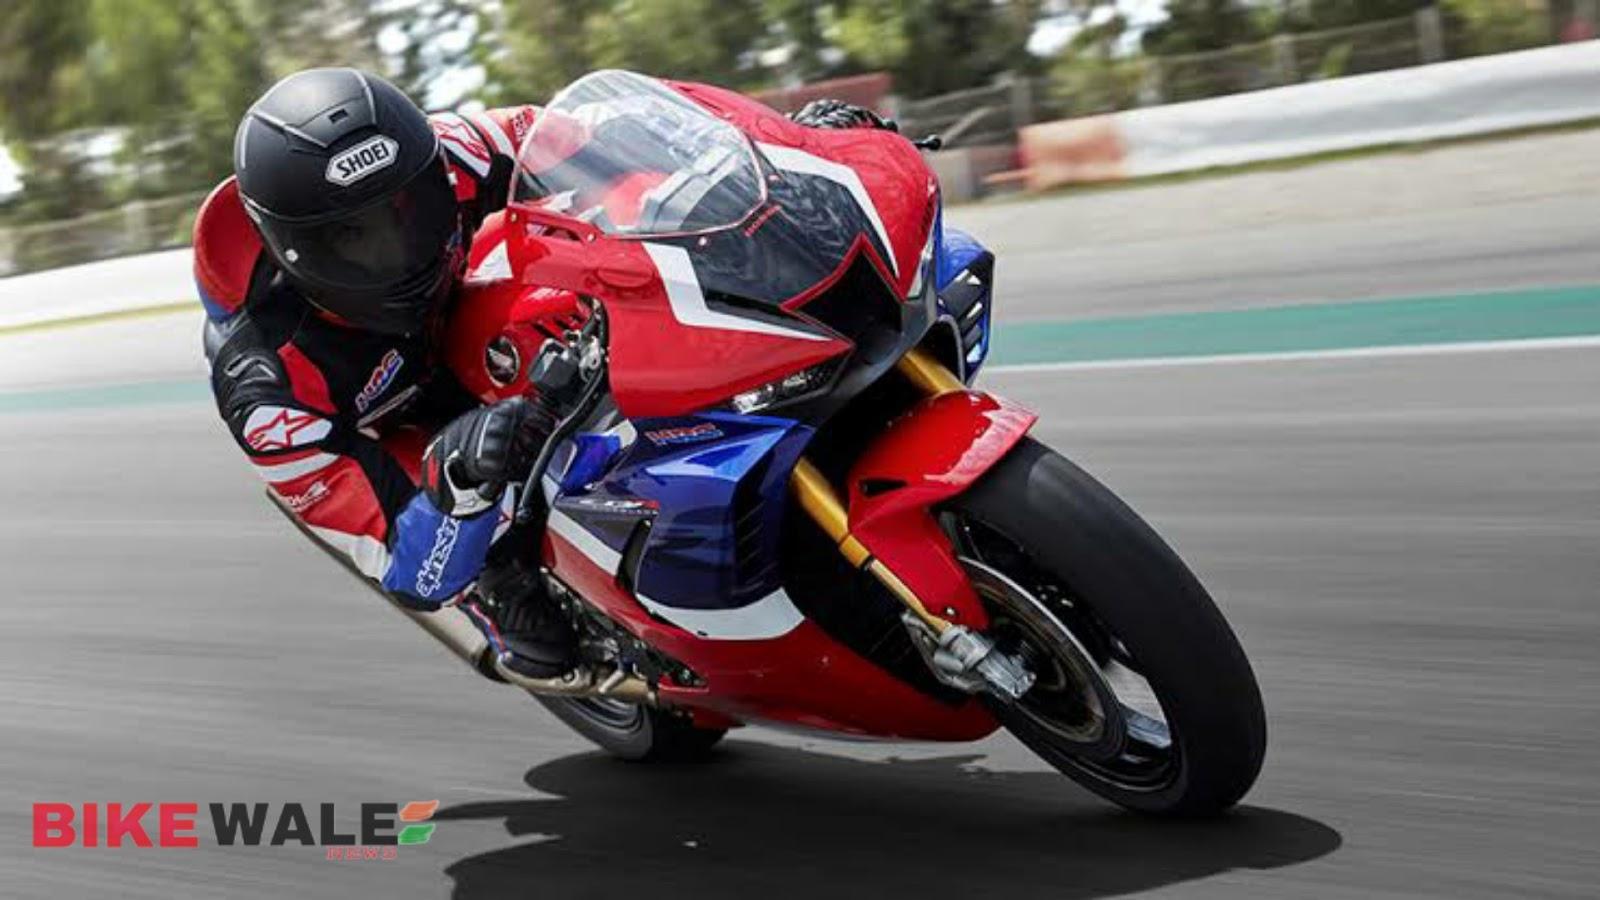 Honda Bike New Model 2020 India - Roblox Games Free Download